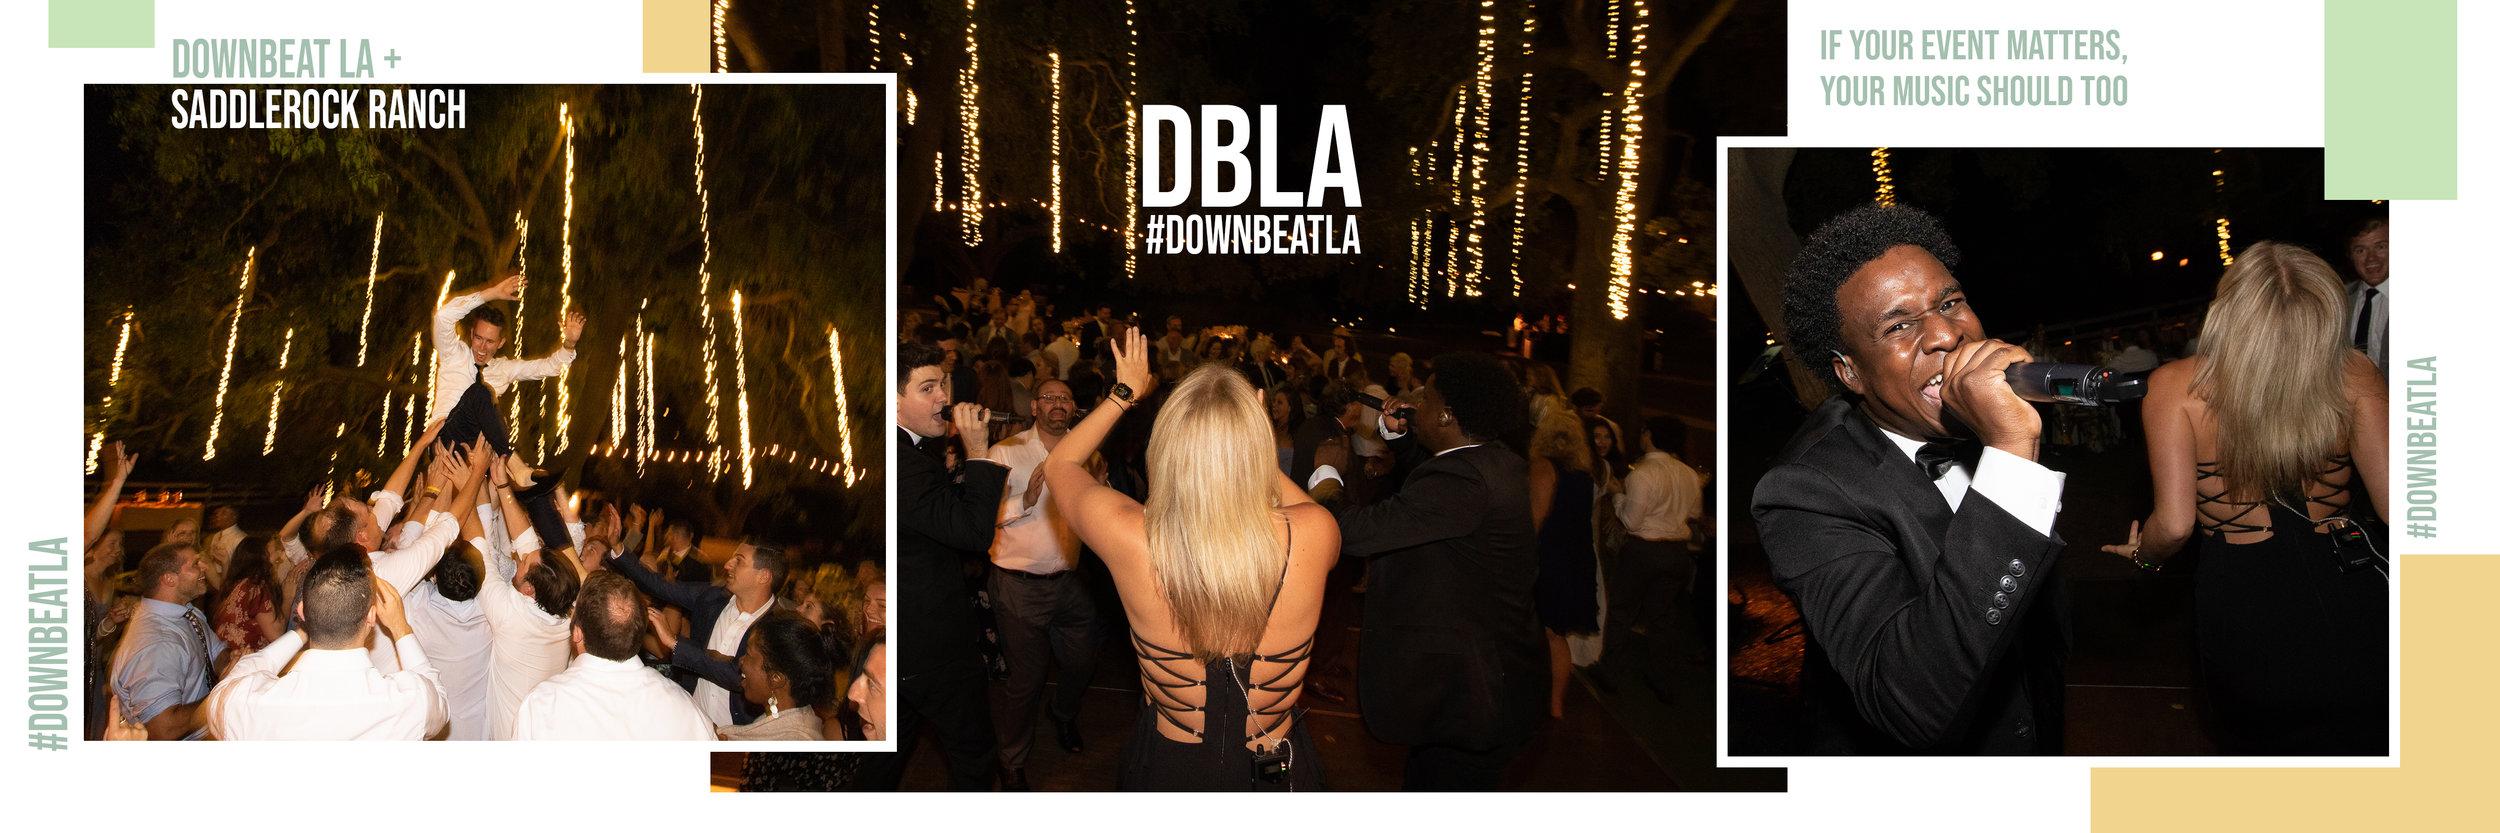 DBLA-Saddlerock-Insta-Layout.jpg